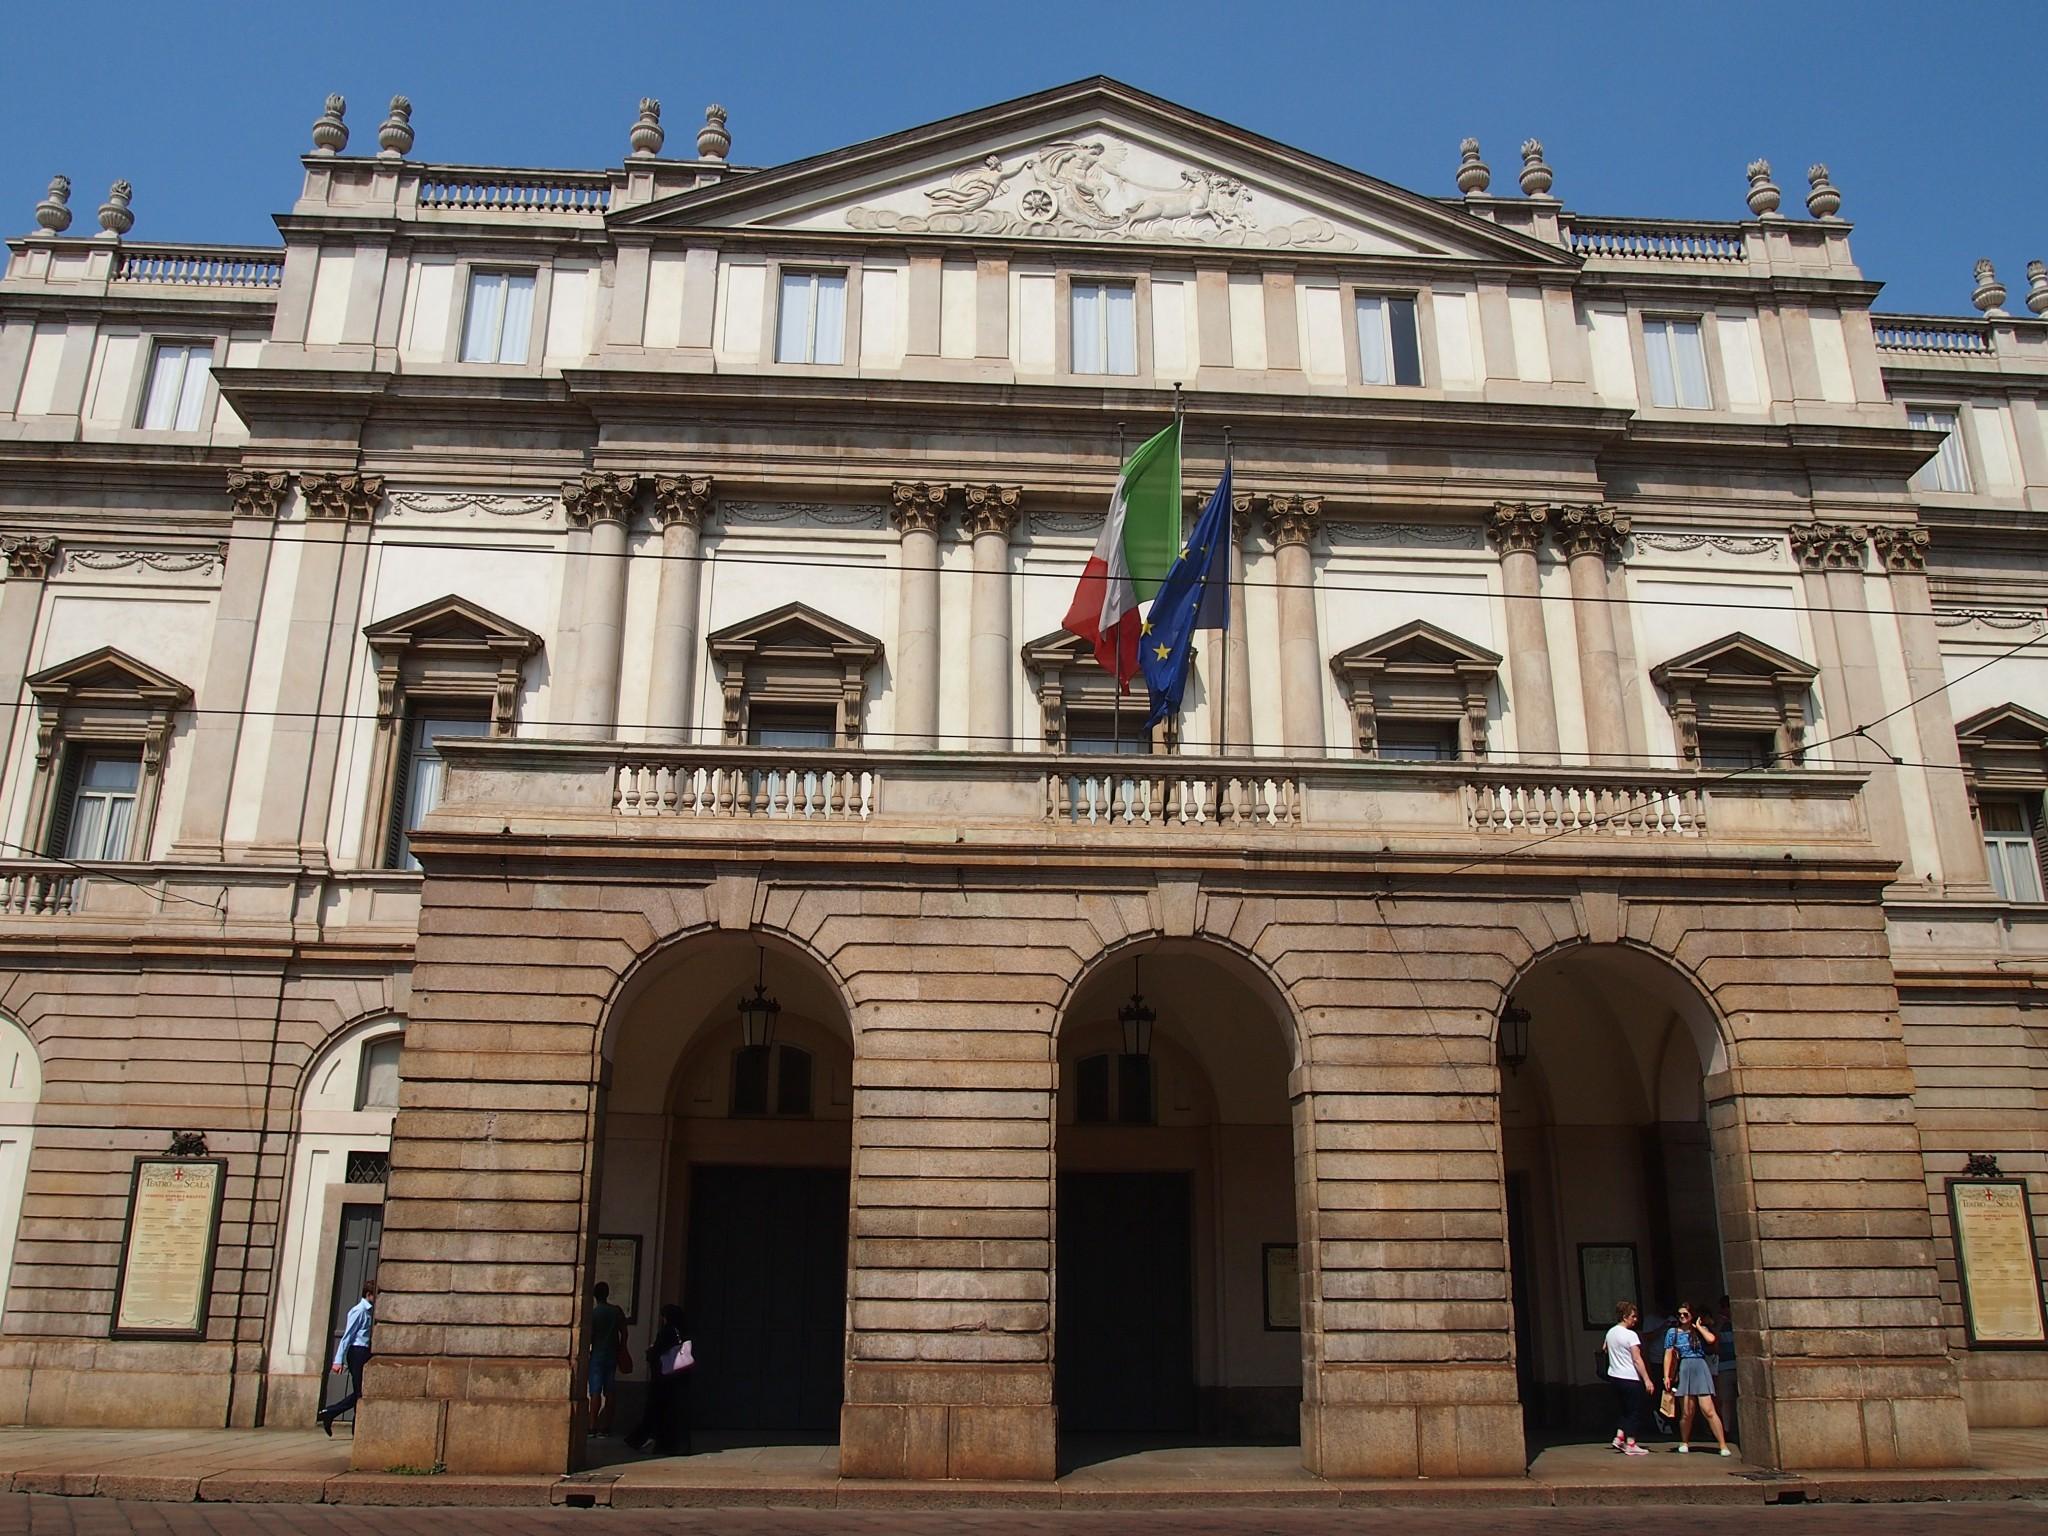 scala, oper, mailand, milano, opernhausm sightseeing